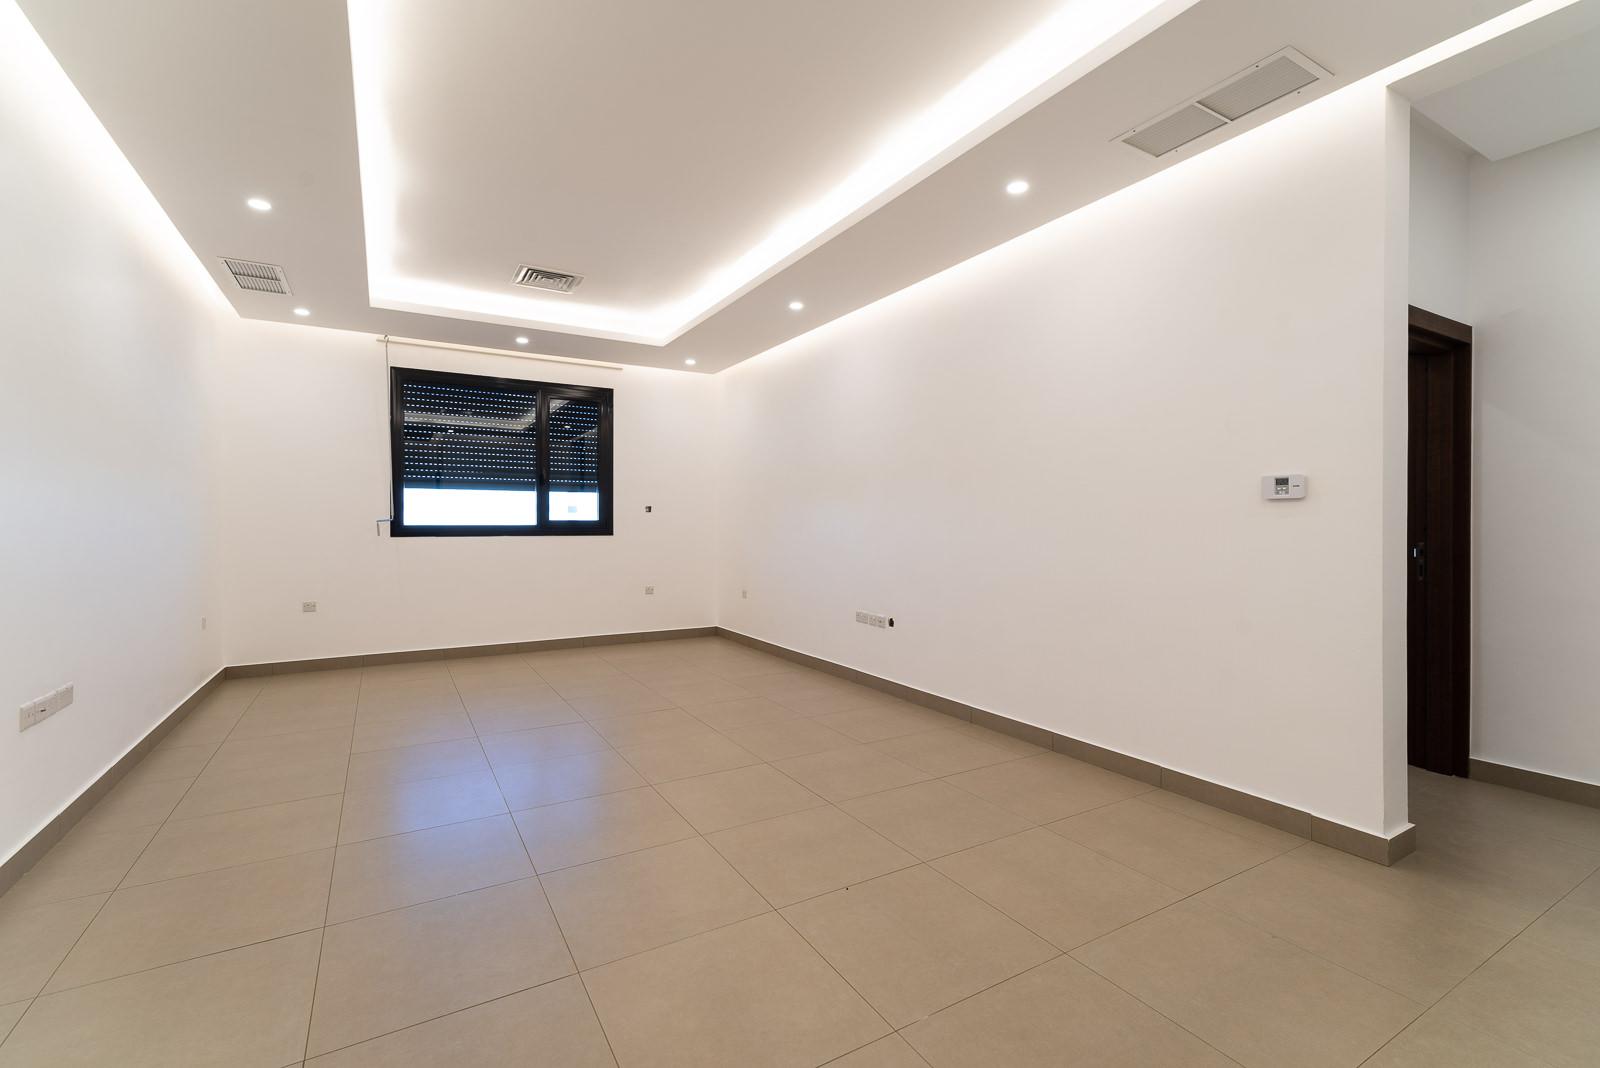 Bayan – large, ufnurnished three bedroom apartment